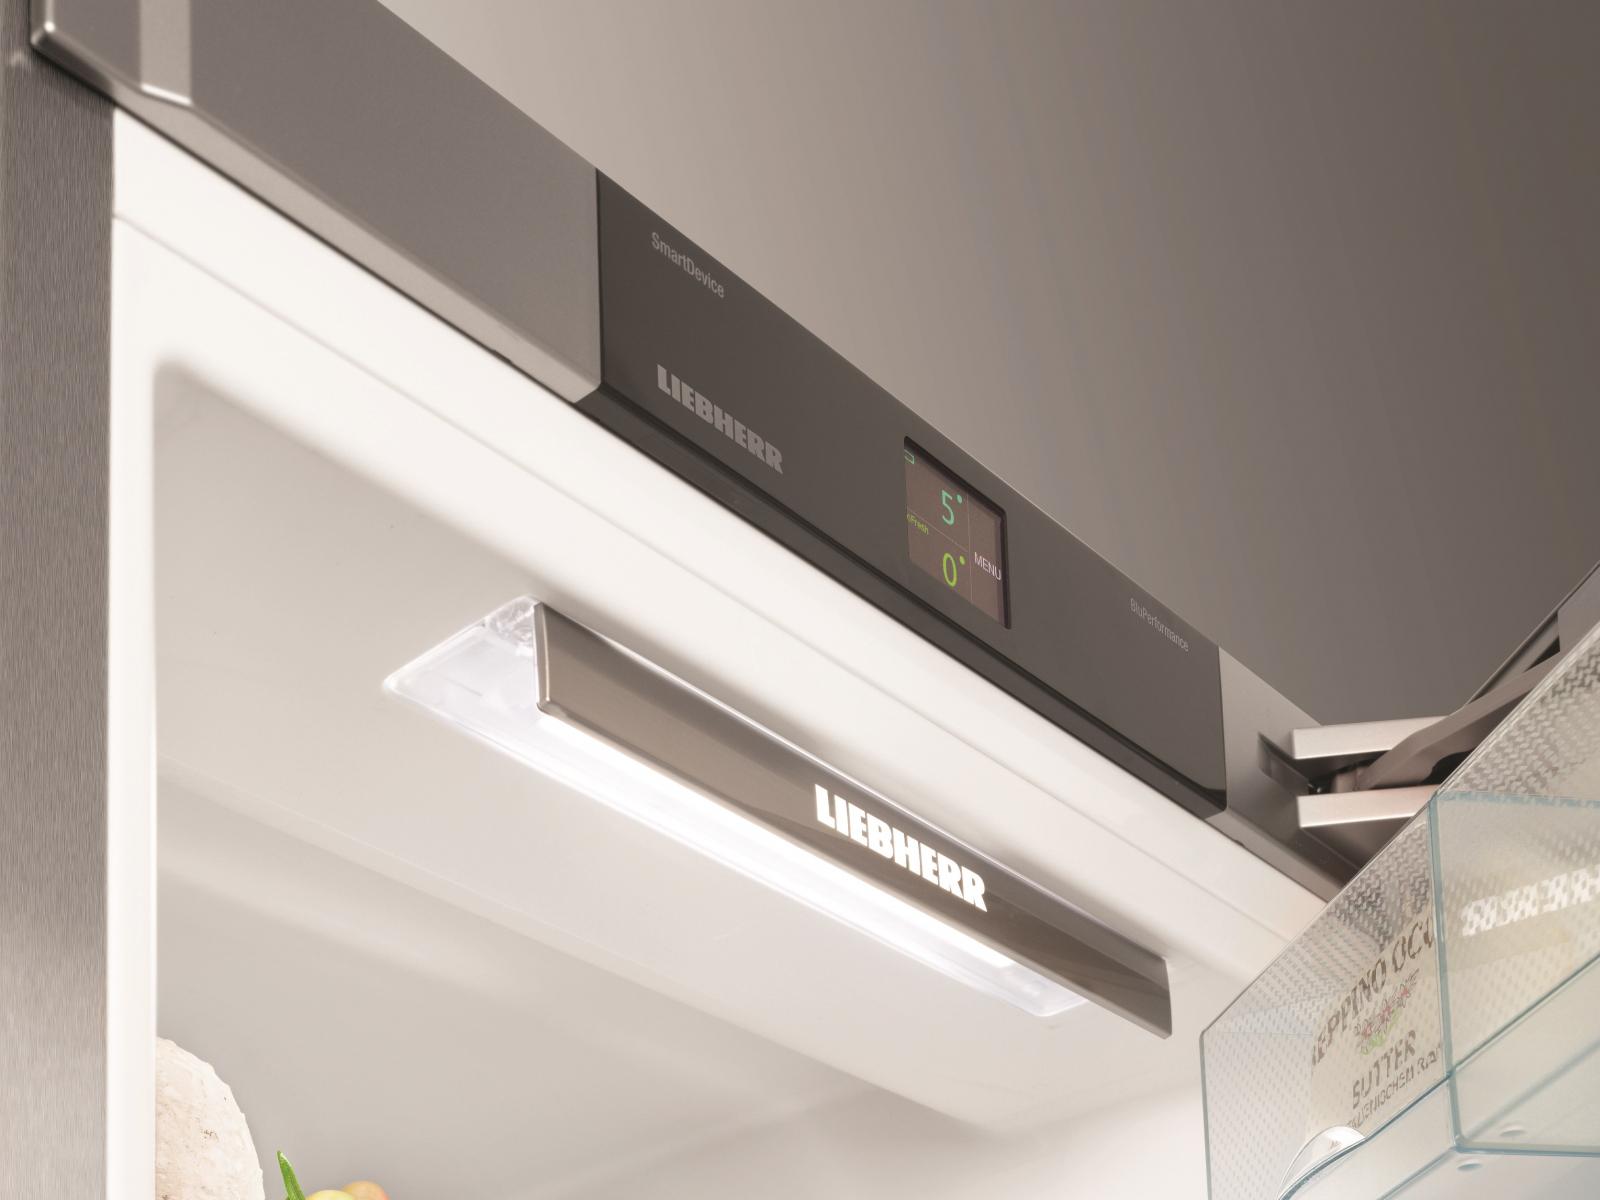 купить Side-by-Side холодильник Liebherr SBSes 8663 Украина фото 12